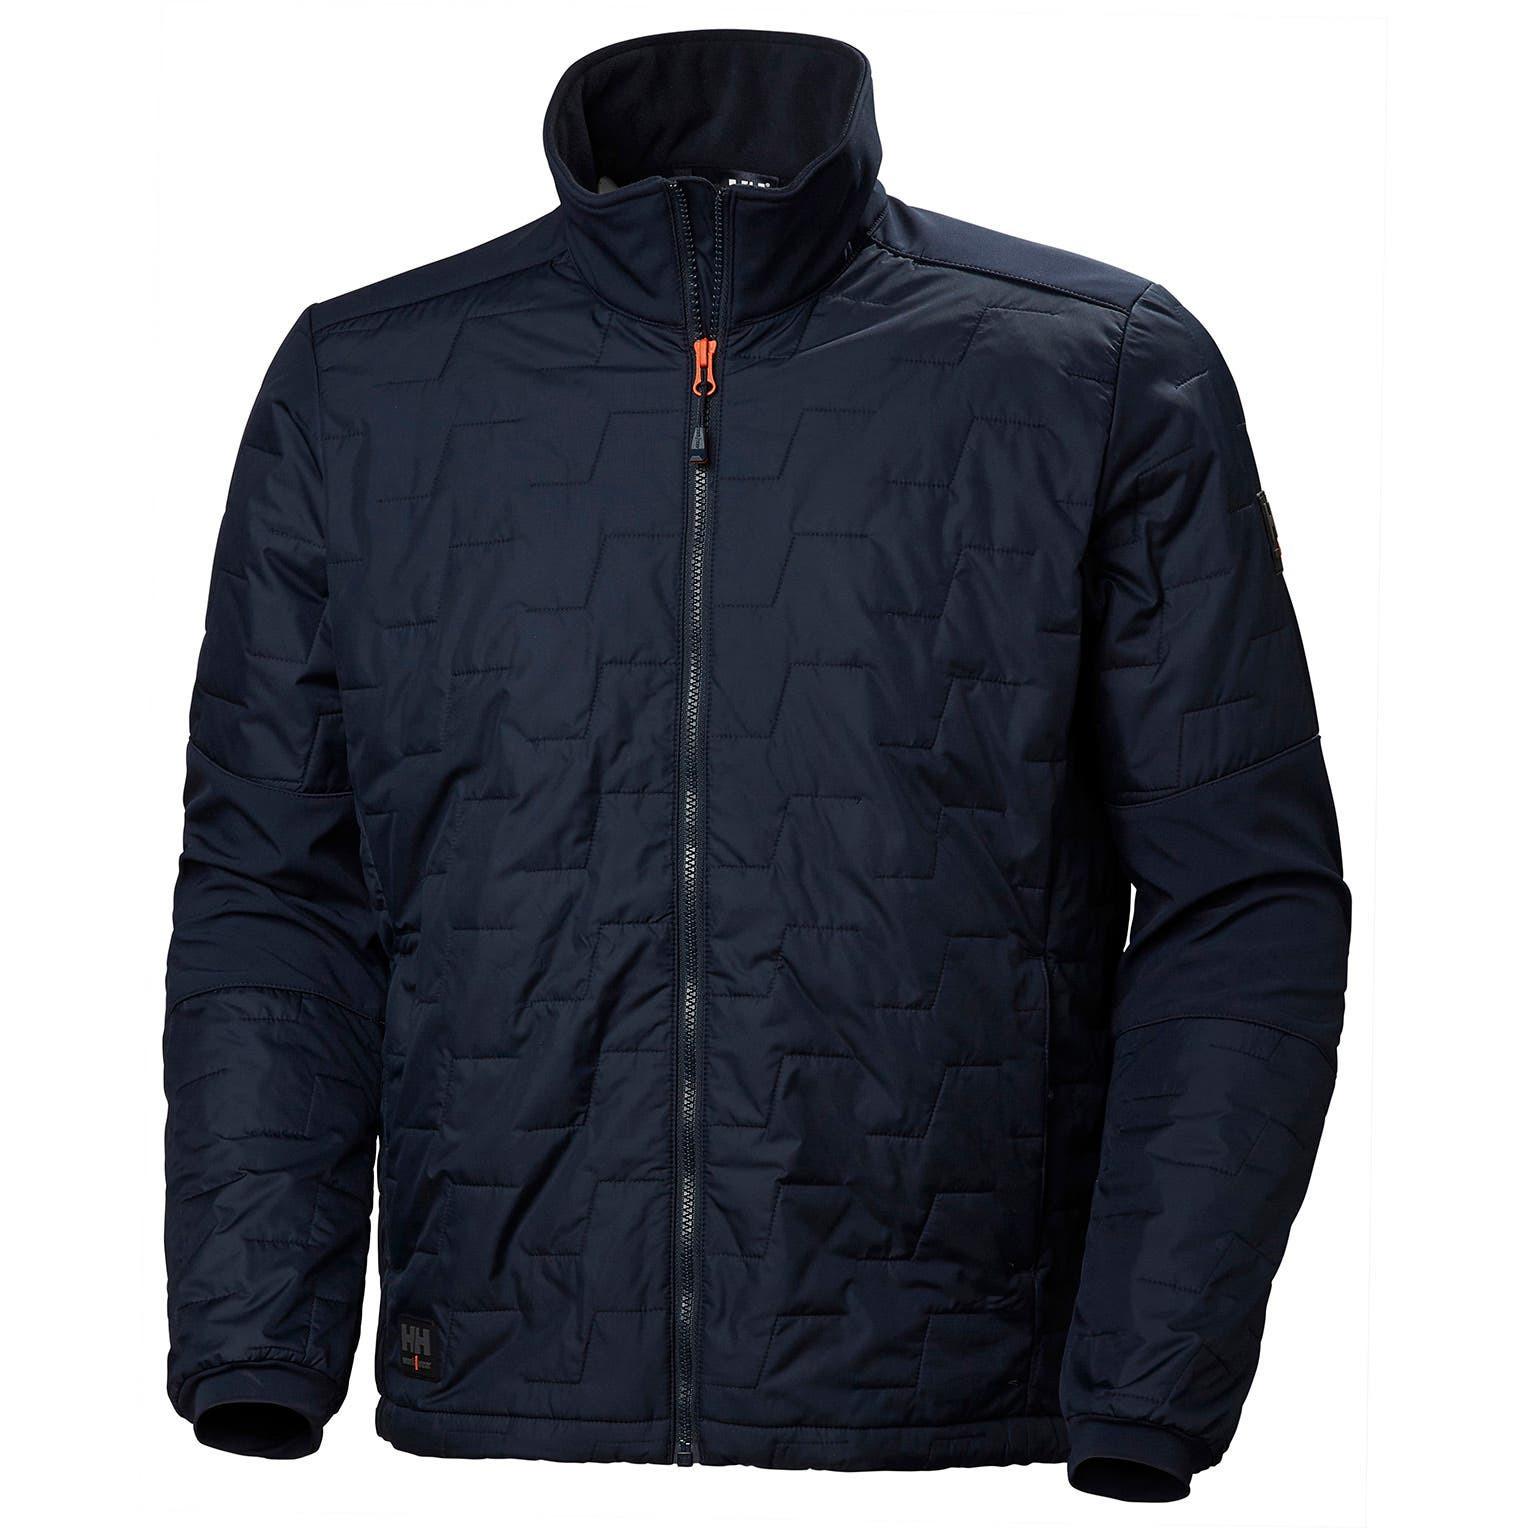 Куртка Helly Hansen Kensington Lifaloft Jacket - 73231 (Navy; M)